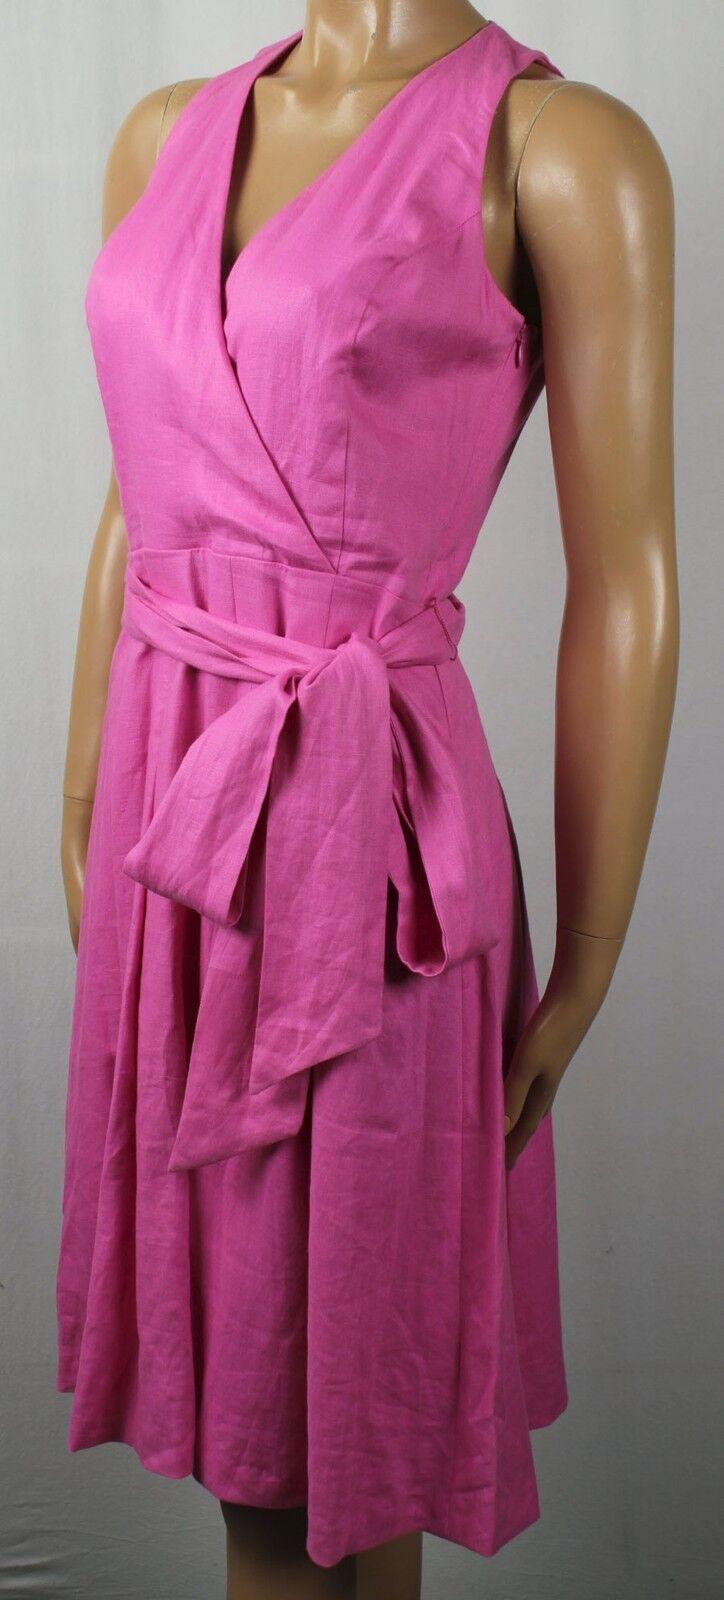 Ralph Lauren Knee Length Sleeveless Rosa Dress NWT